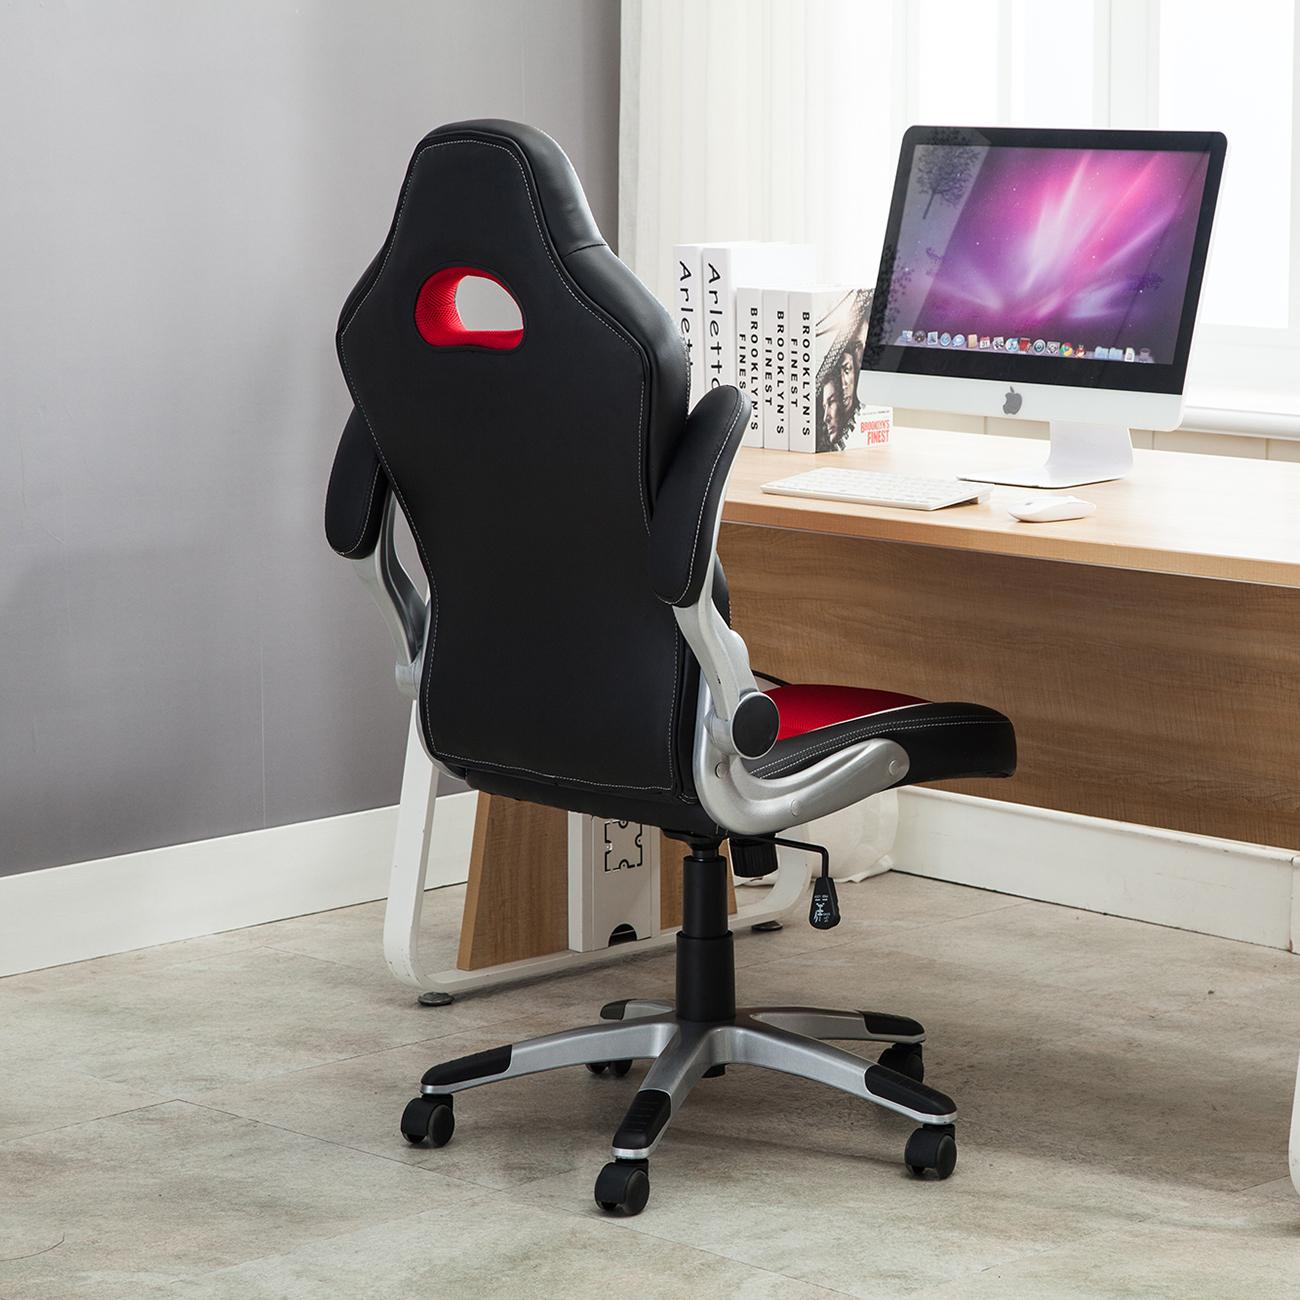 Office Racing Chair Bucket Seat High Back Ergonomic Gaming Computer Flip Armrest